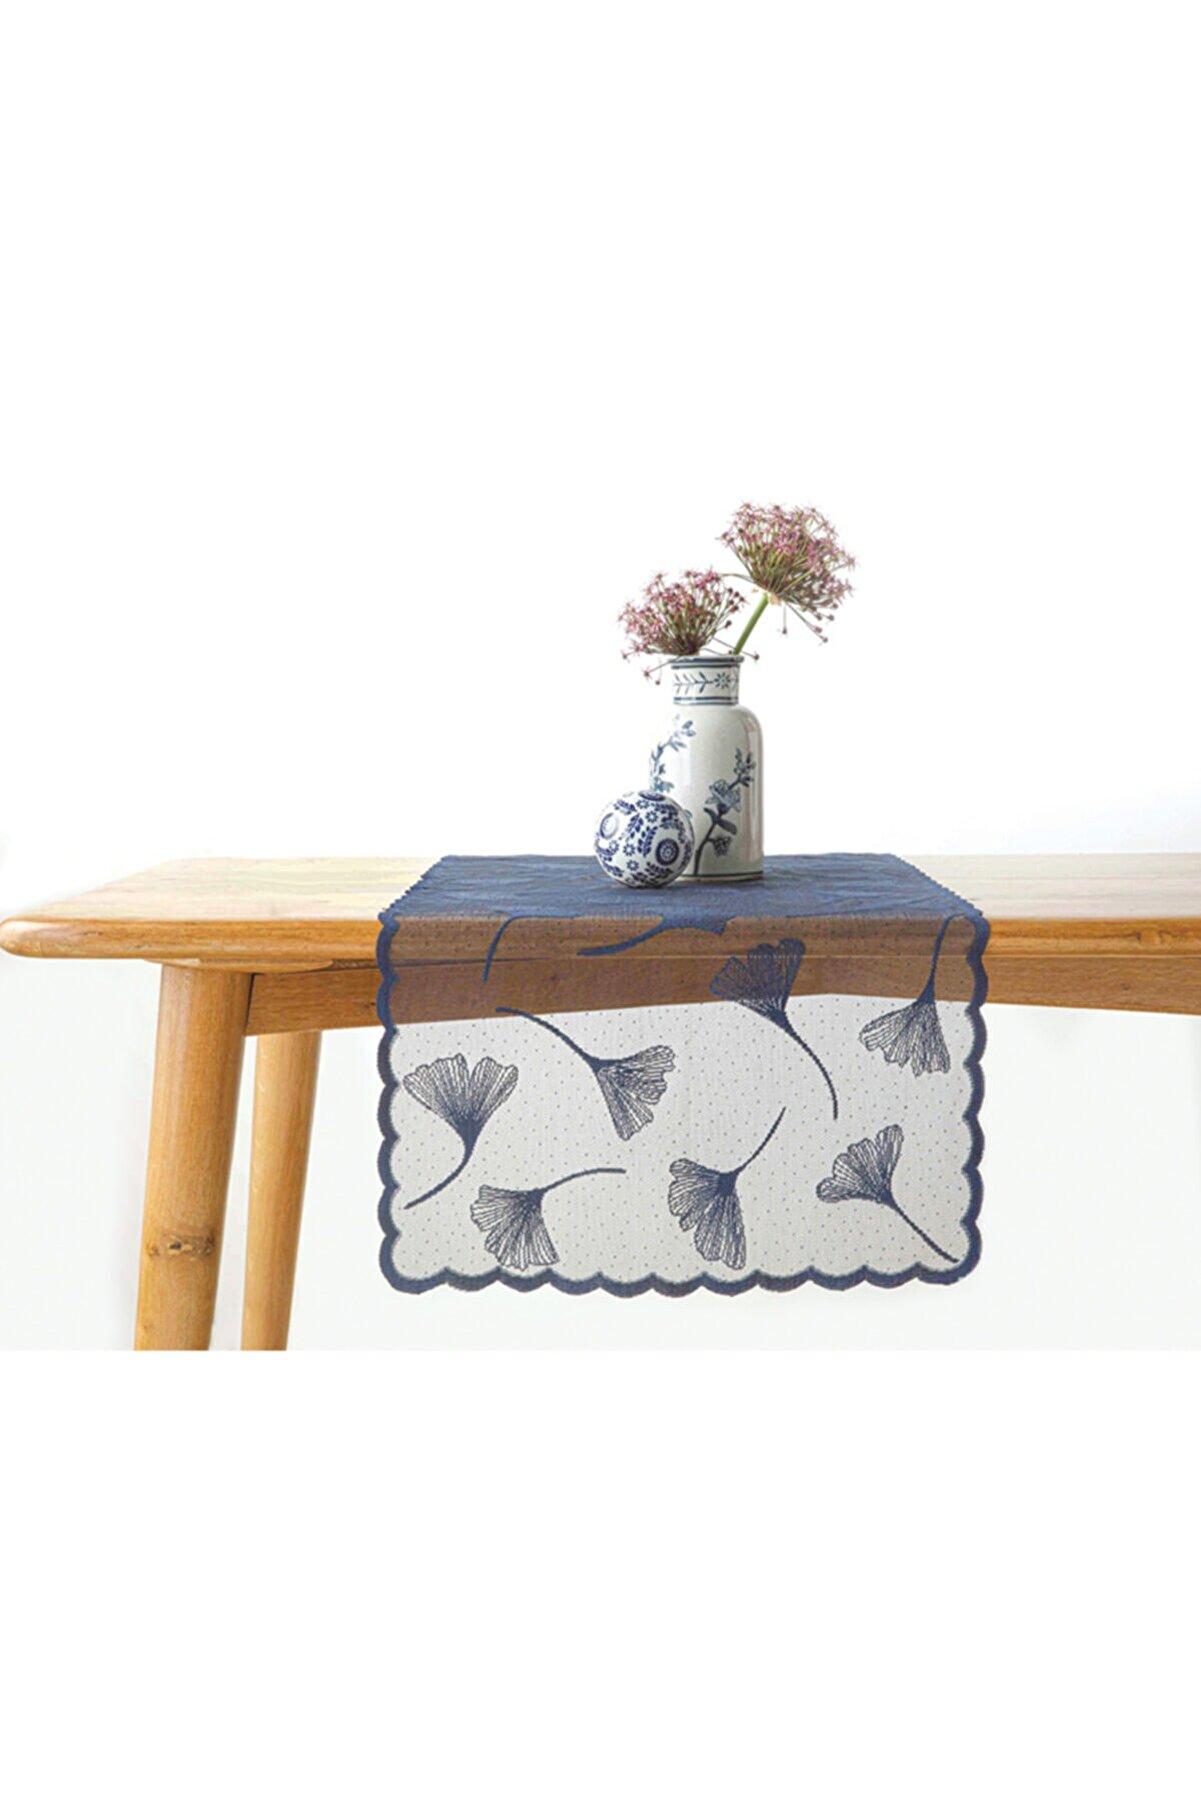 English Home Gingko Biloba Örme Runner 45x150 cm Lacivert